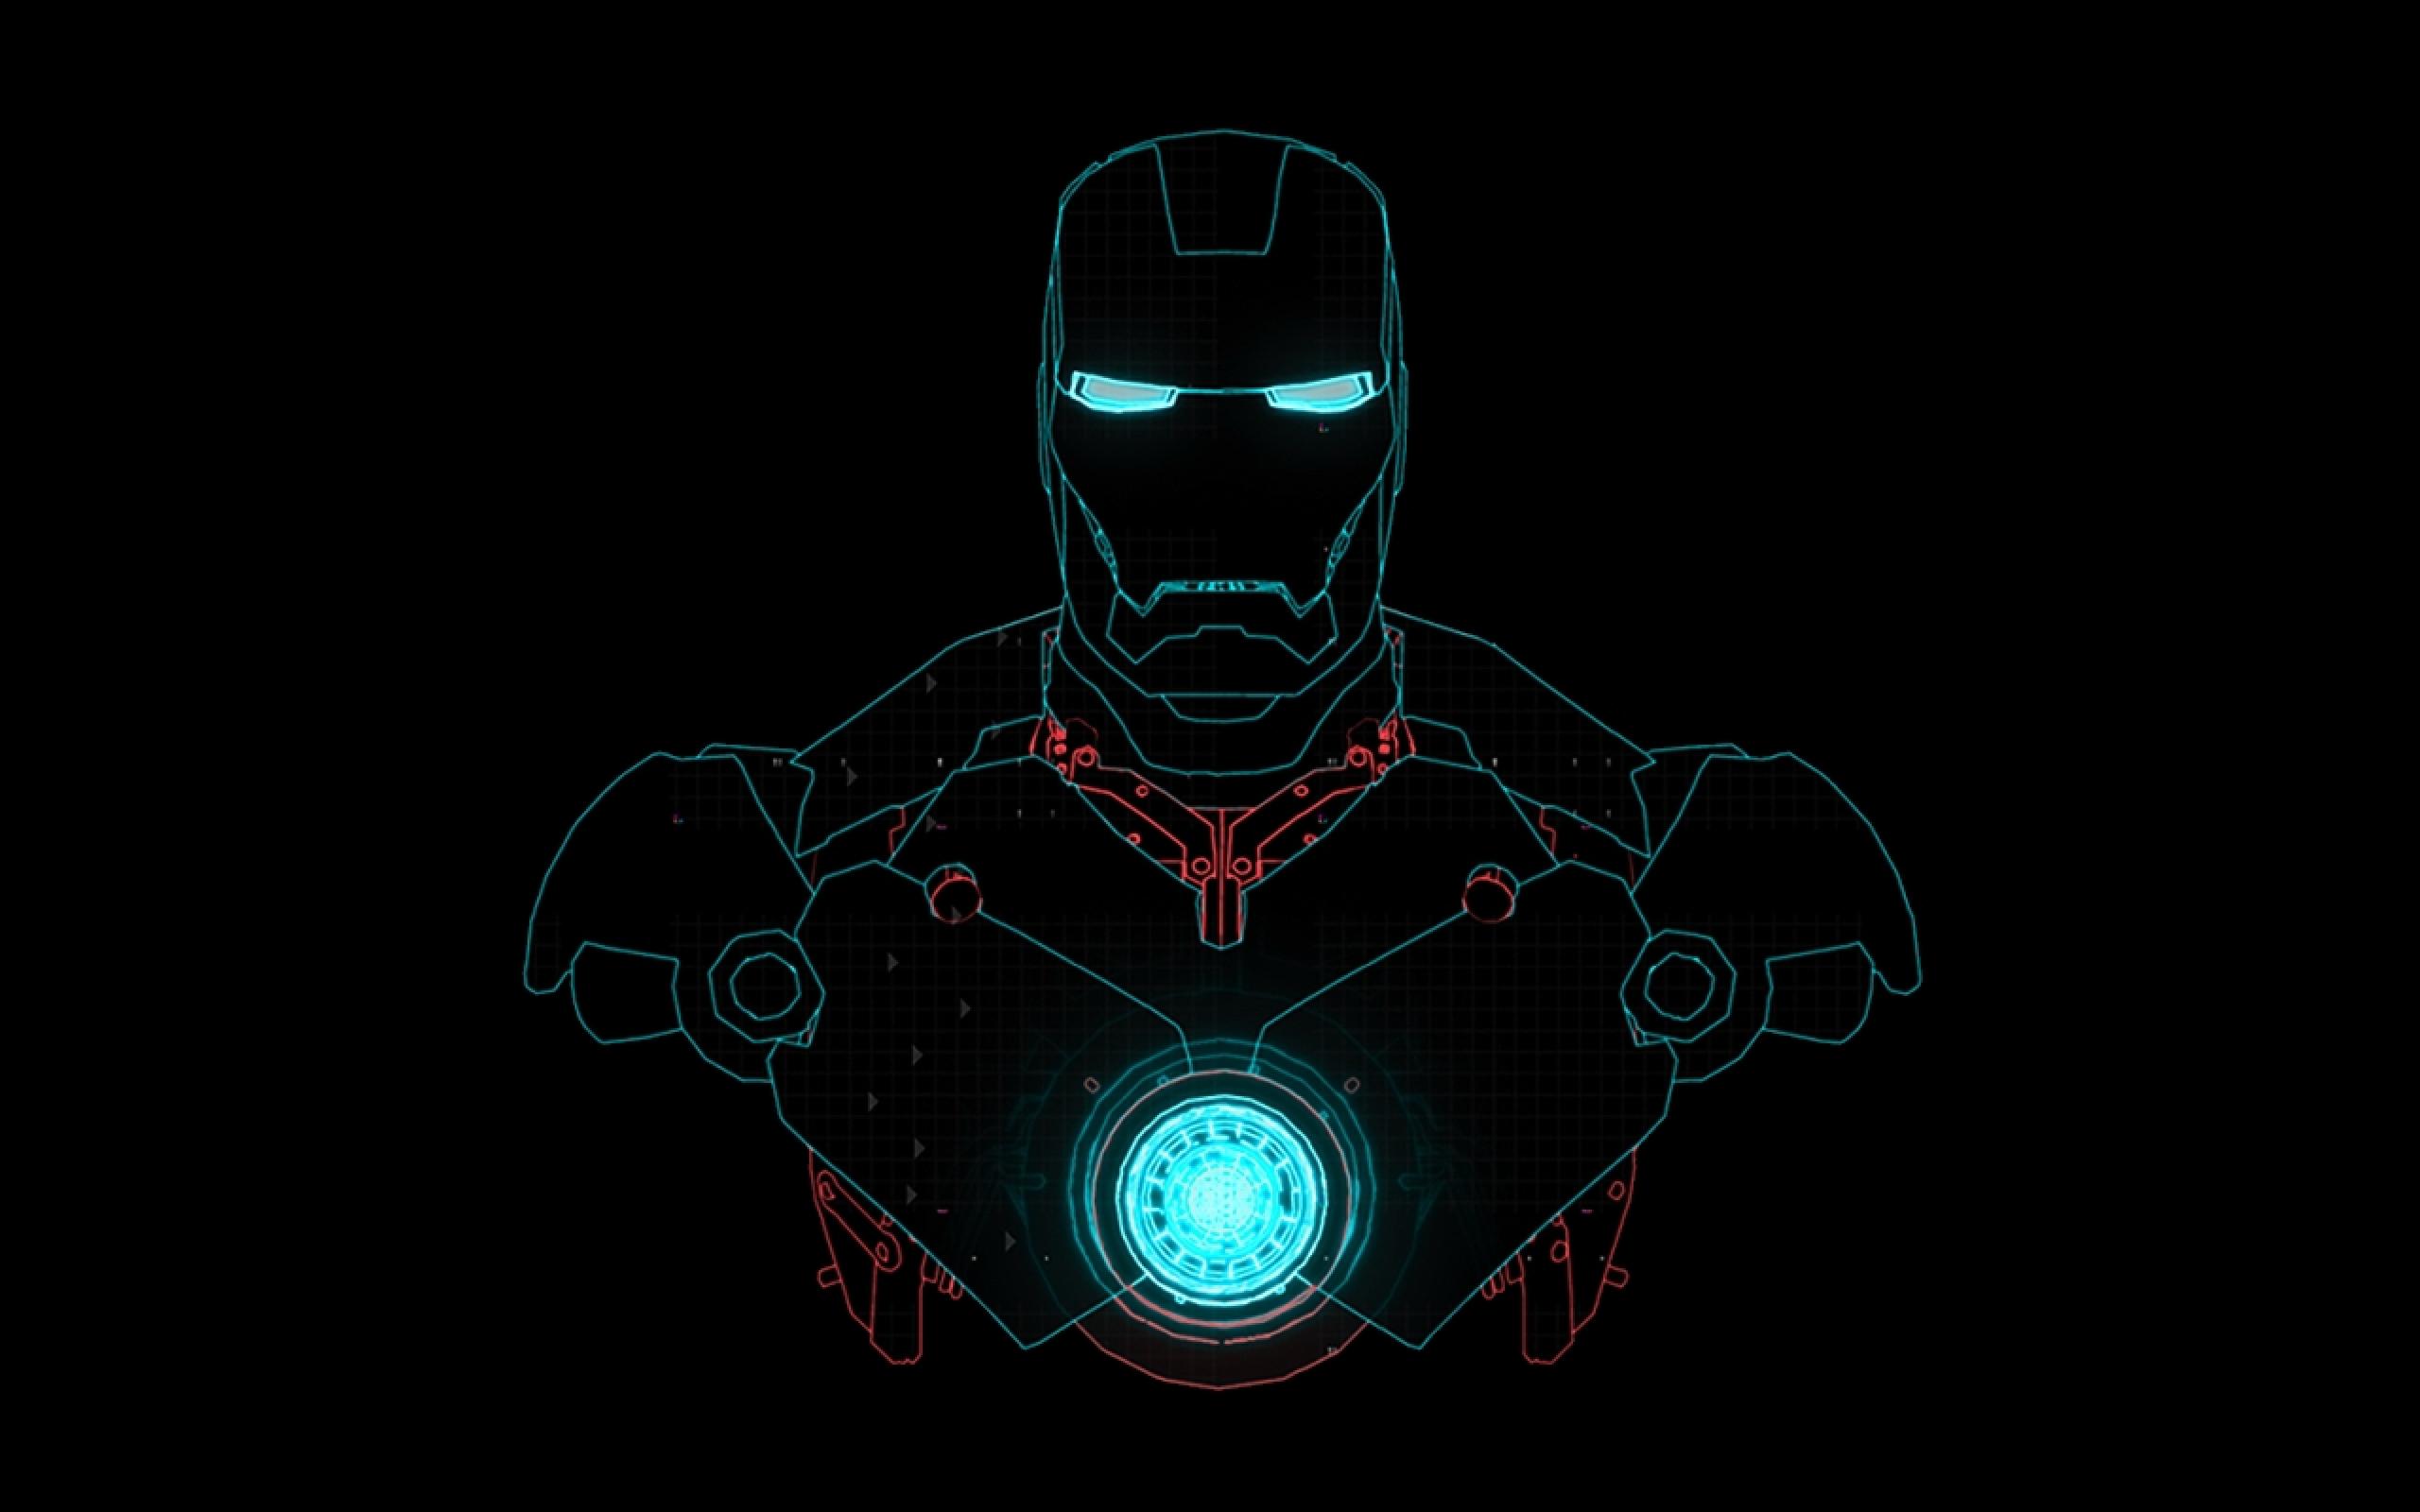 Iron Man Amoled Wallpapers Iron Man Wallpaper Man Wallpaper Iron Man Comic